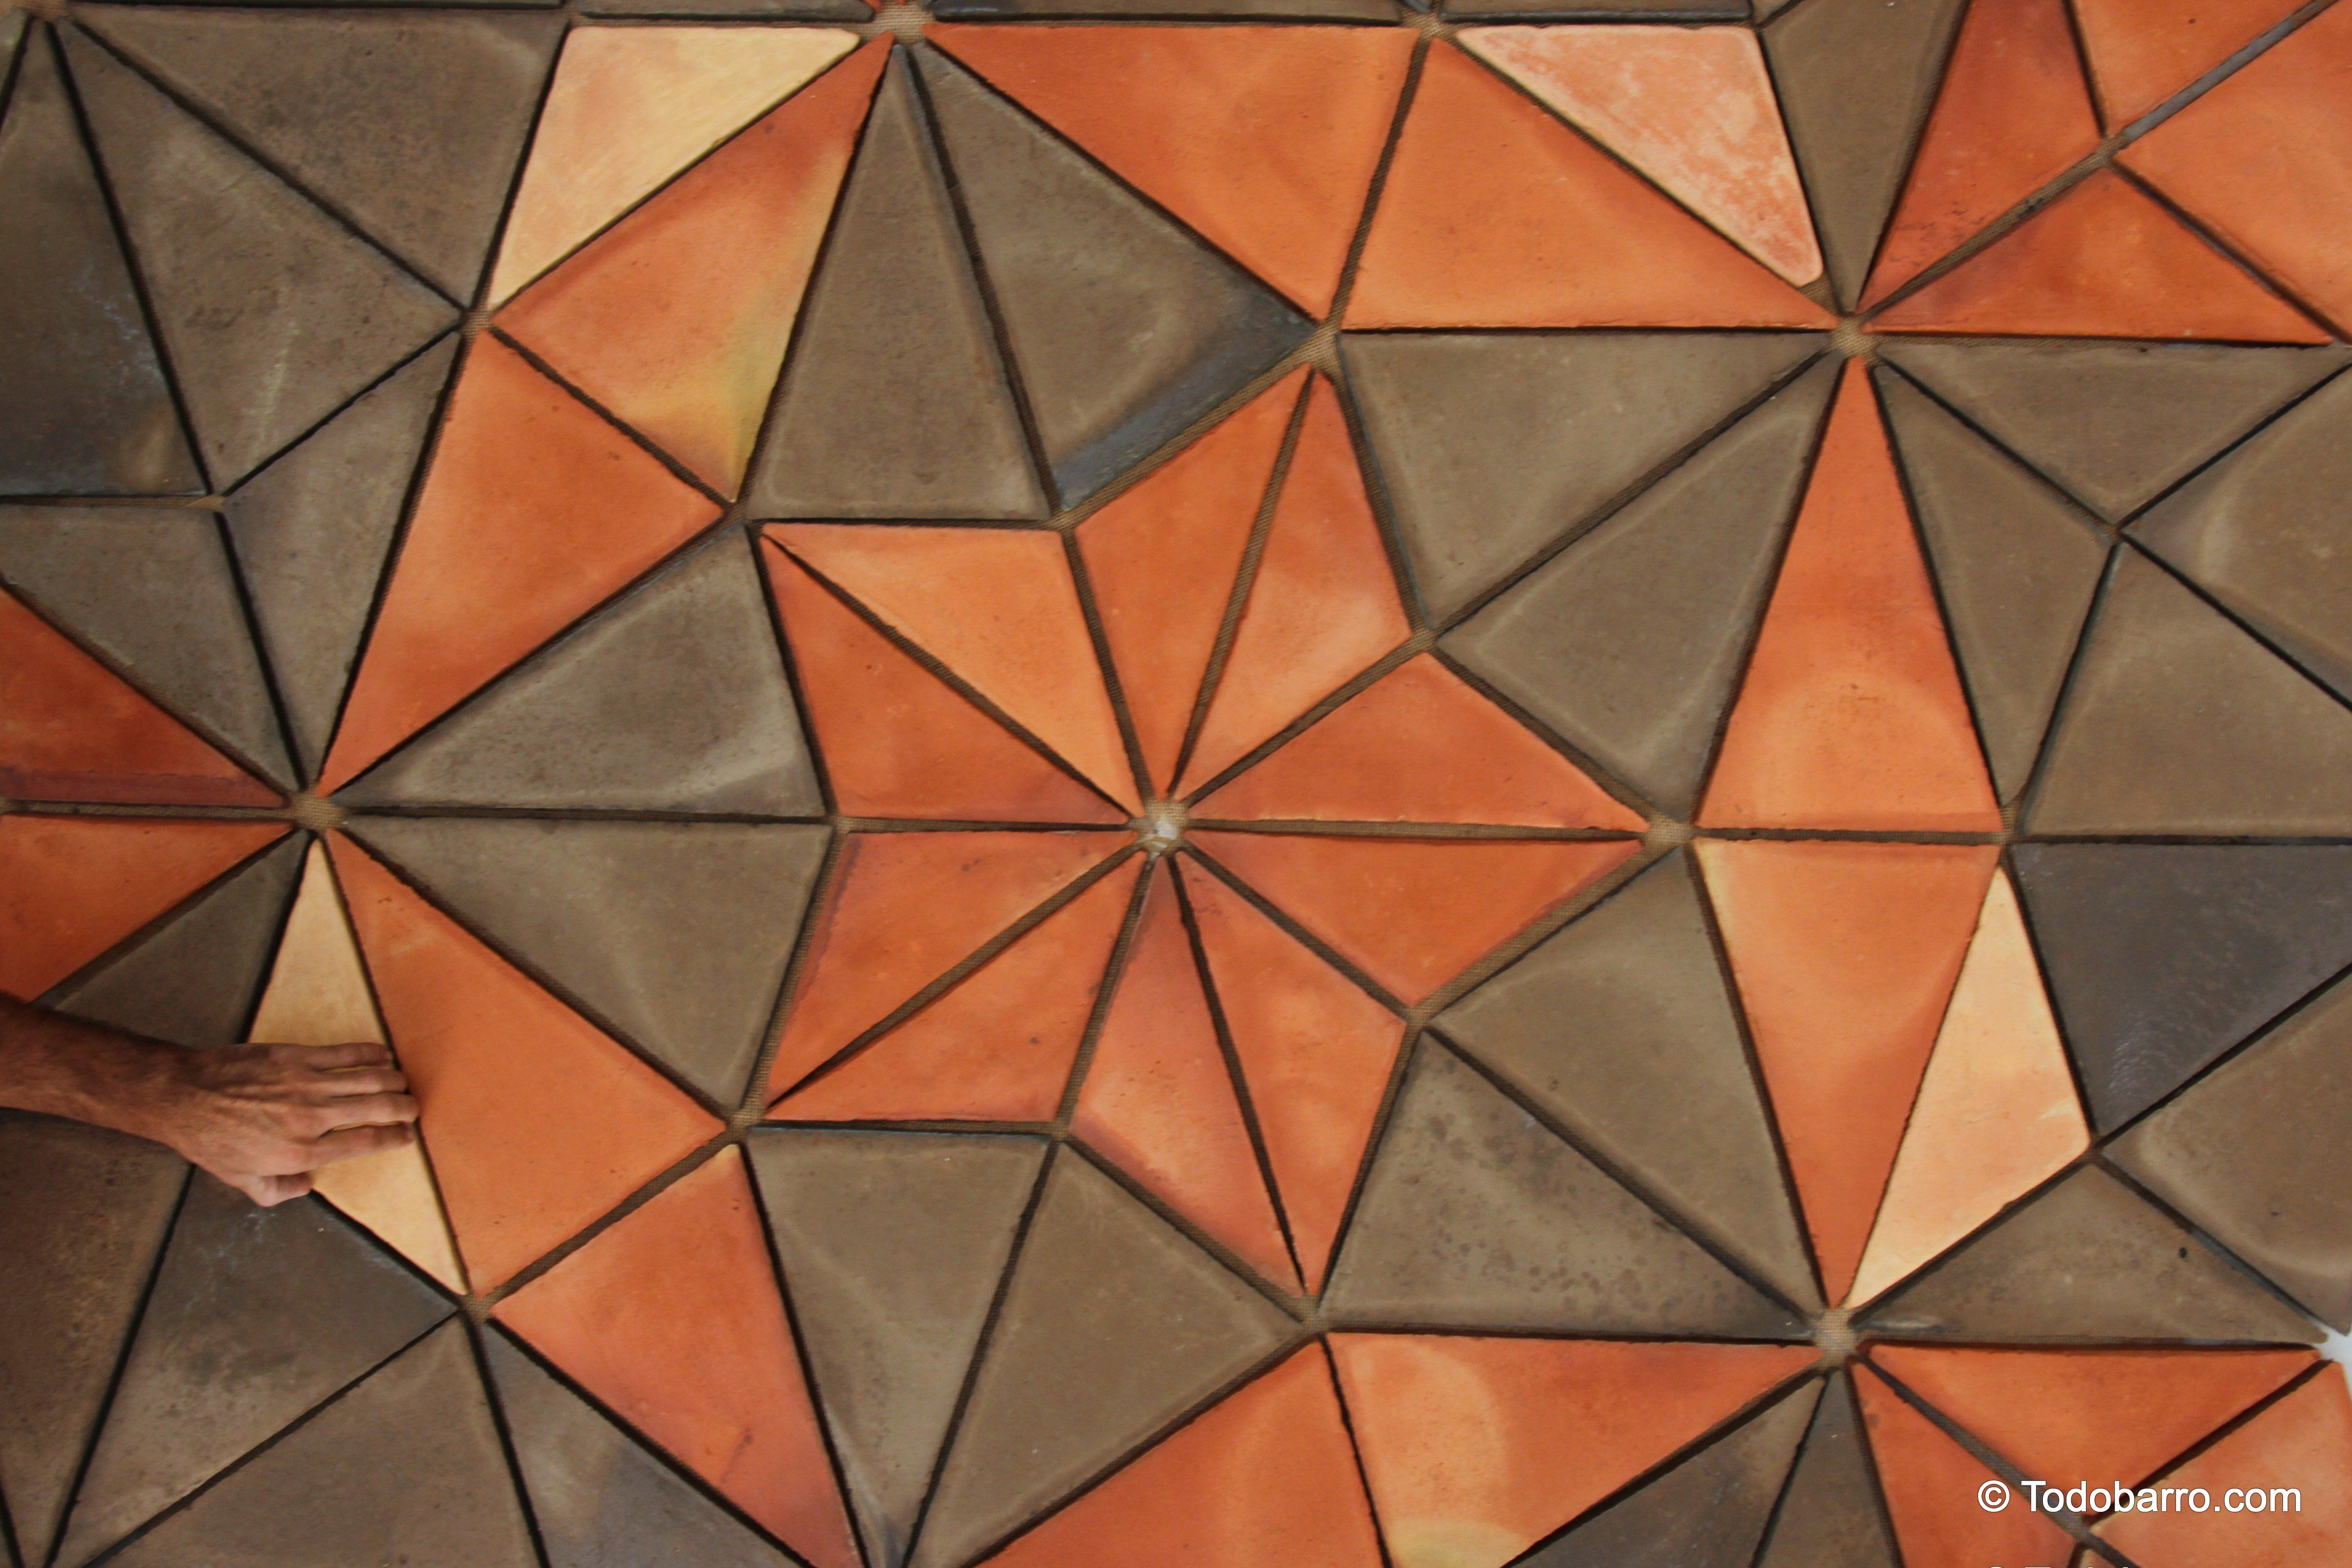 Teselado de penrose spanish terracotta floor tiles todobarro teselado de penrose spanish terracotta floor tiles dailygadgetfo Image collections